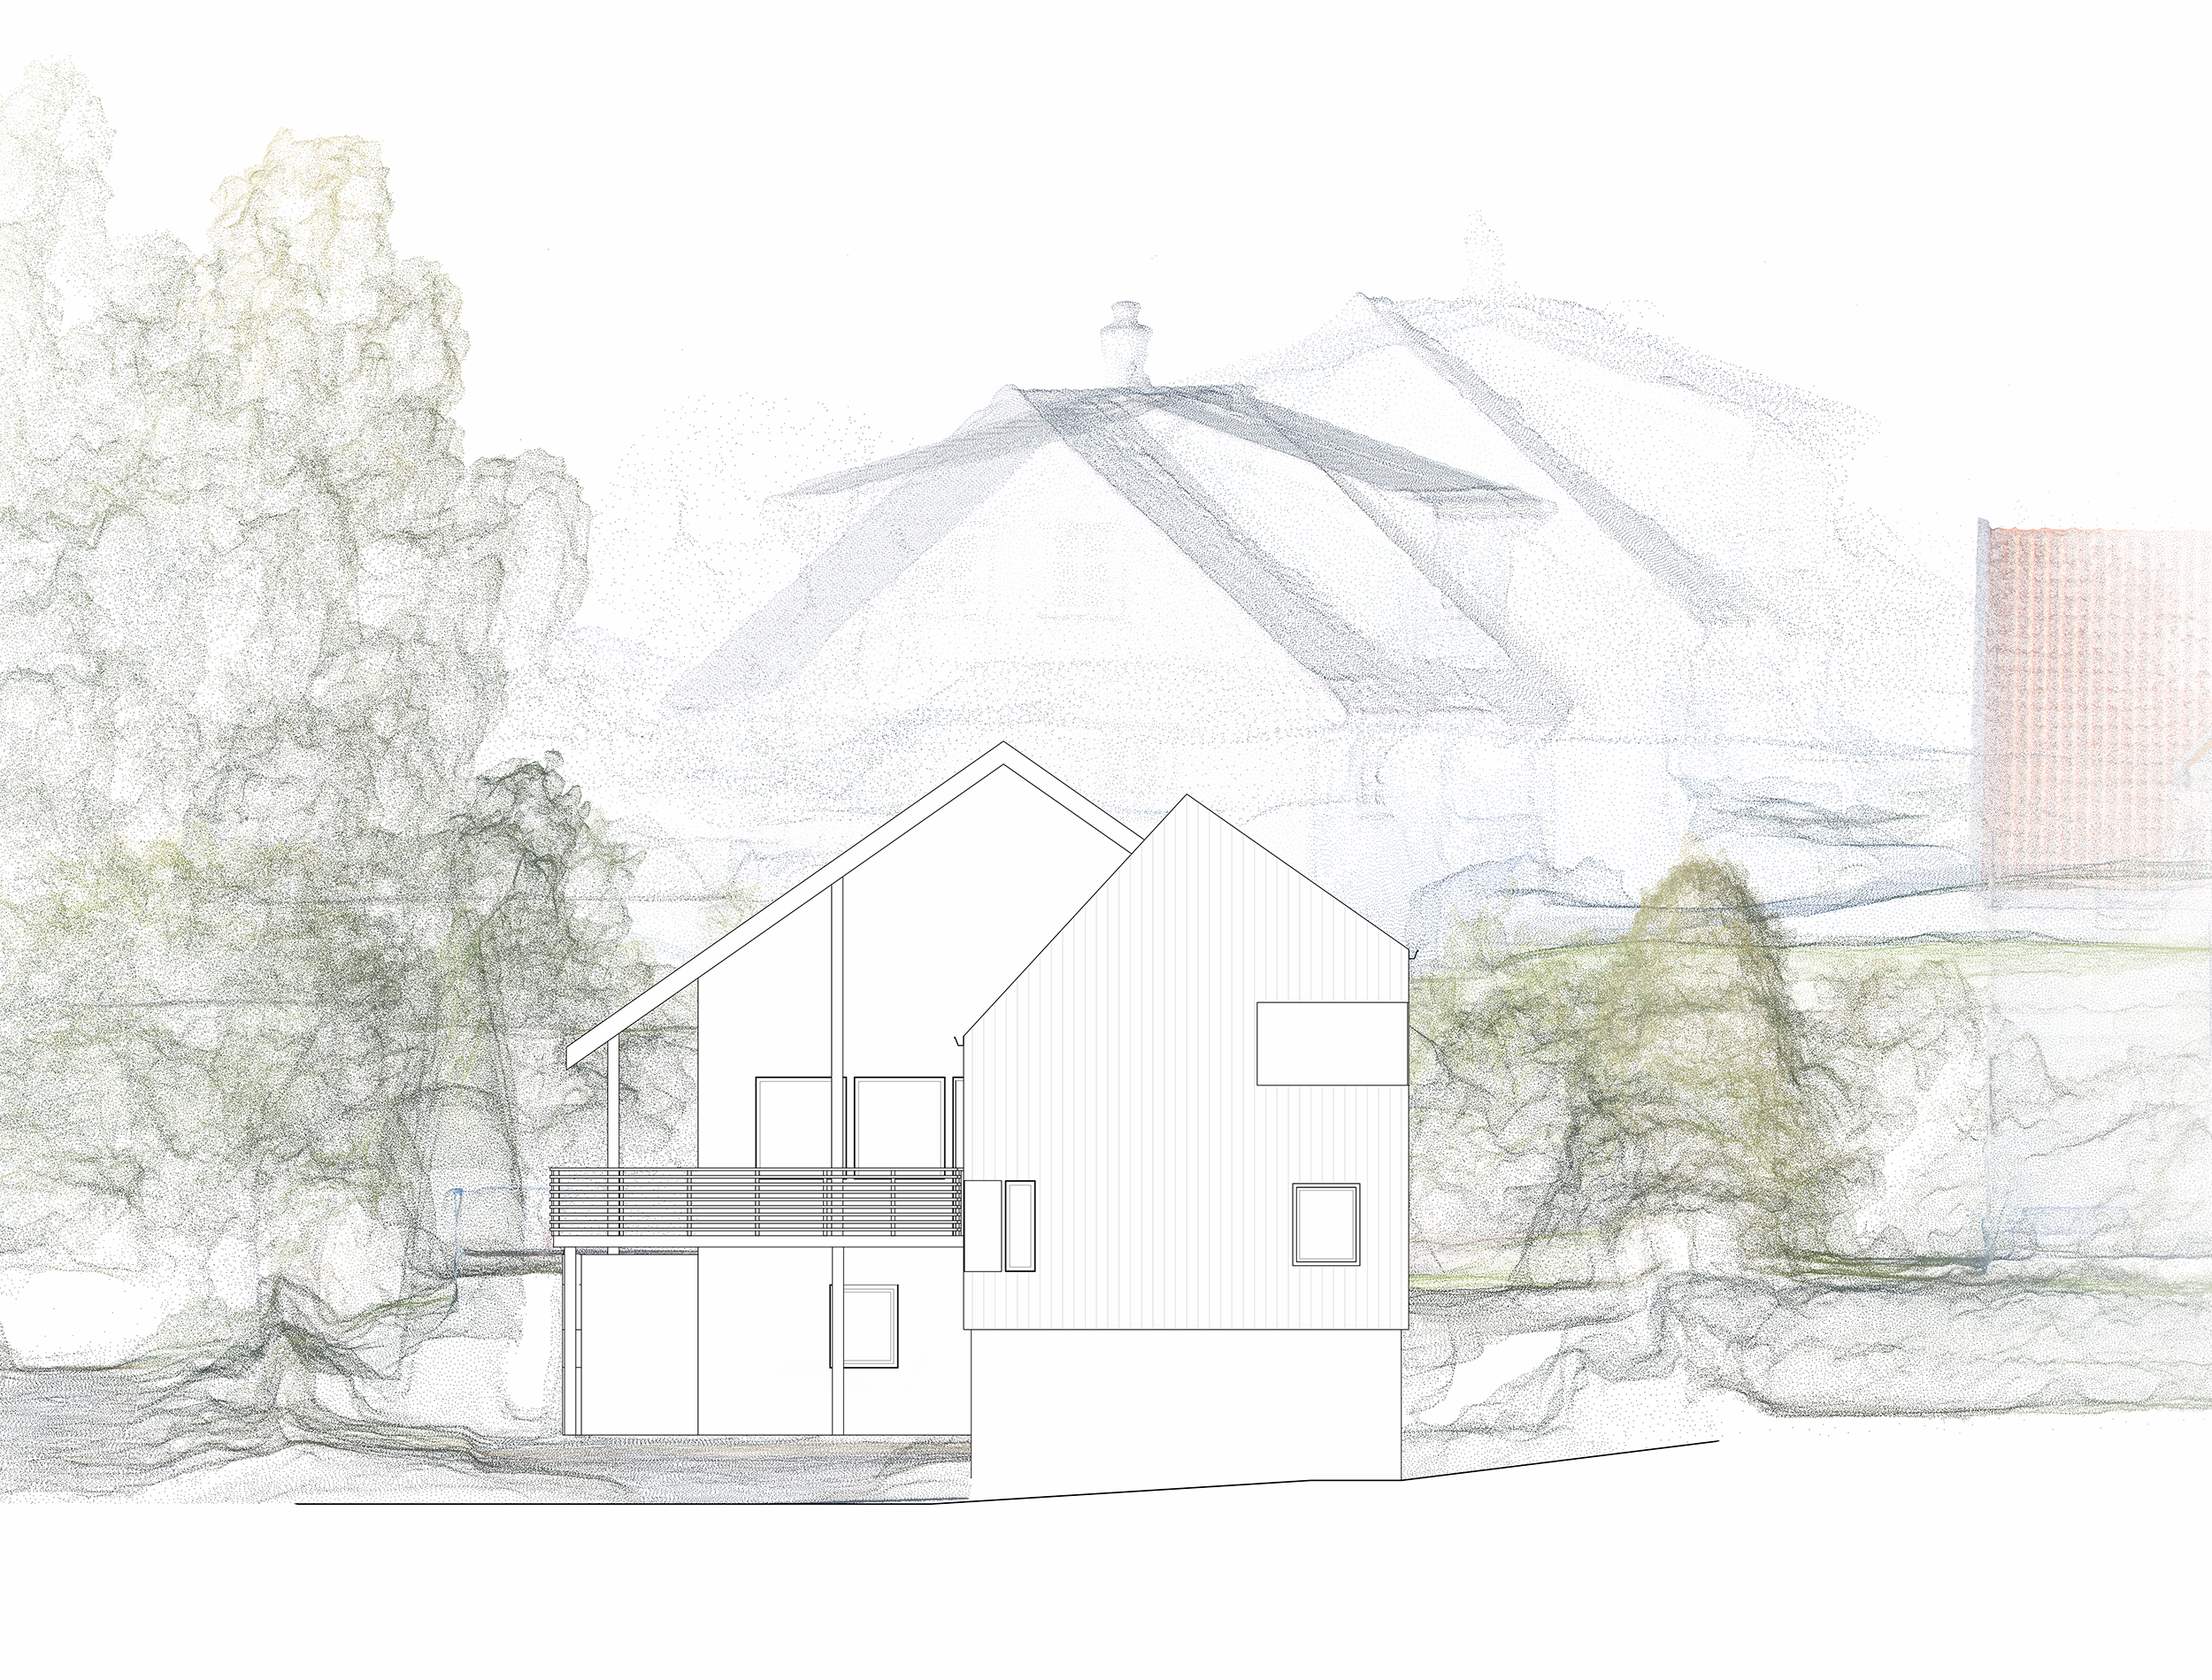 Forunderlig Arkitektur - 1603 - Fasade Øst